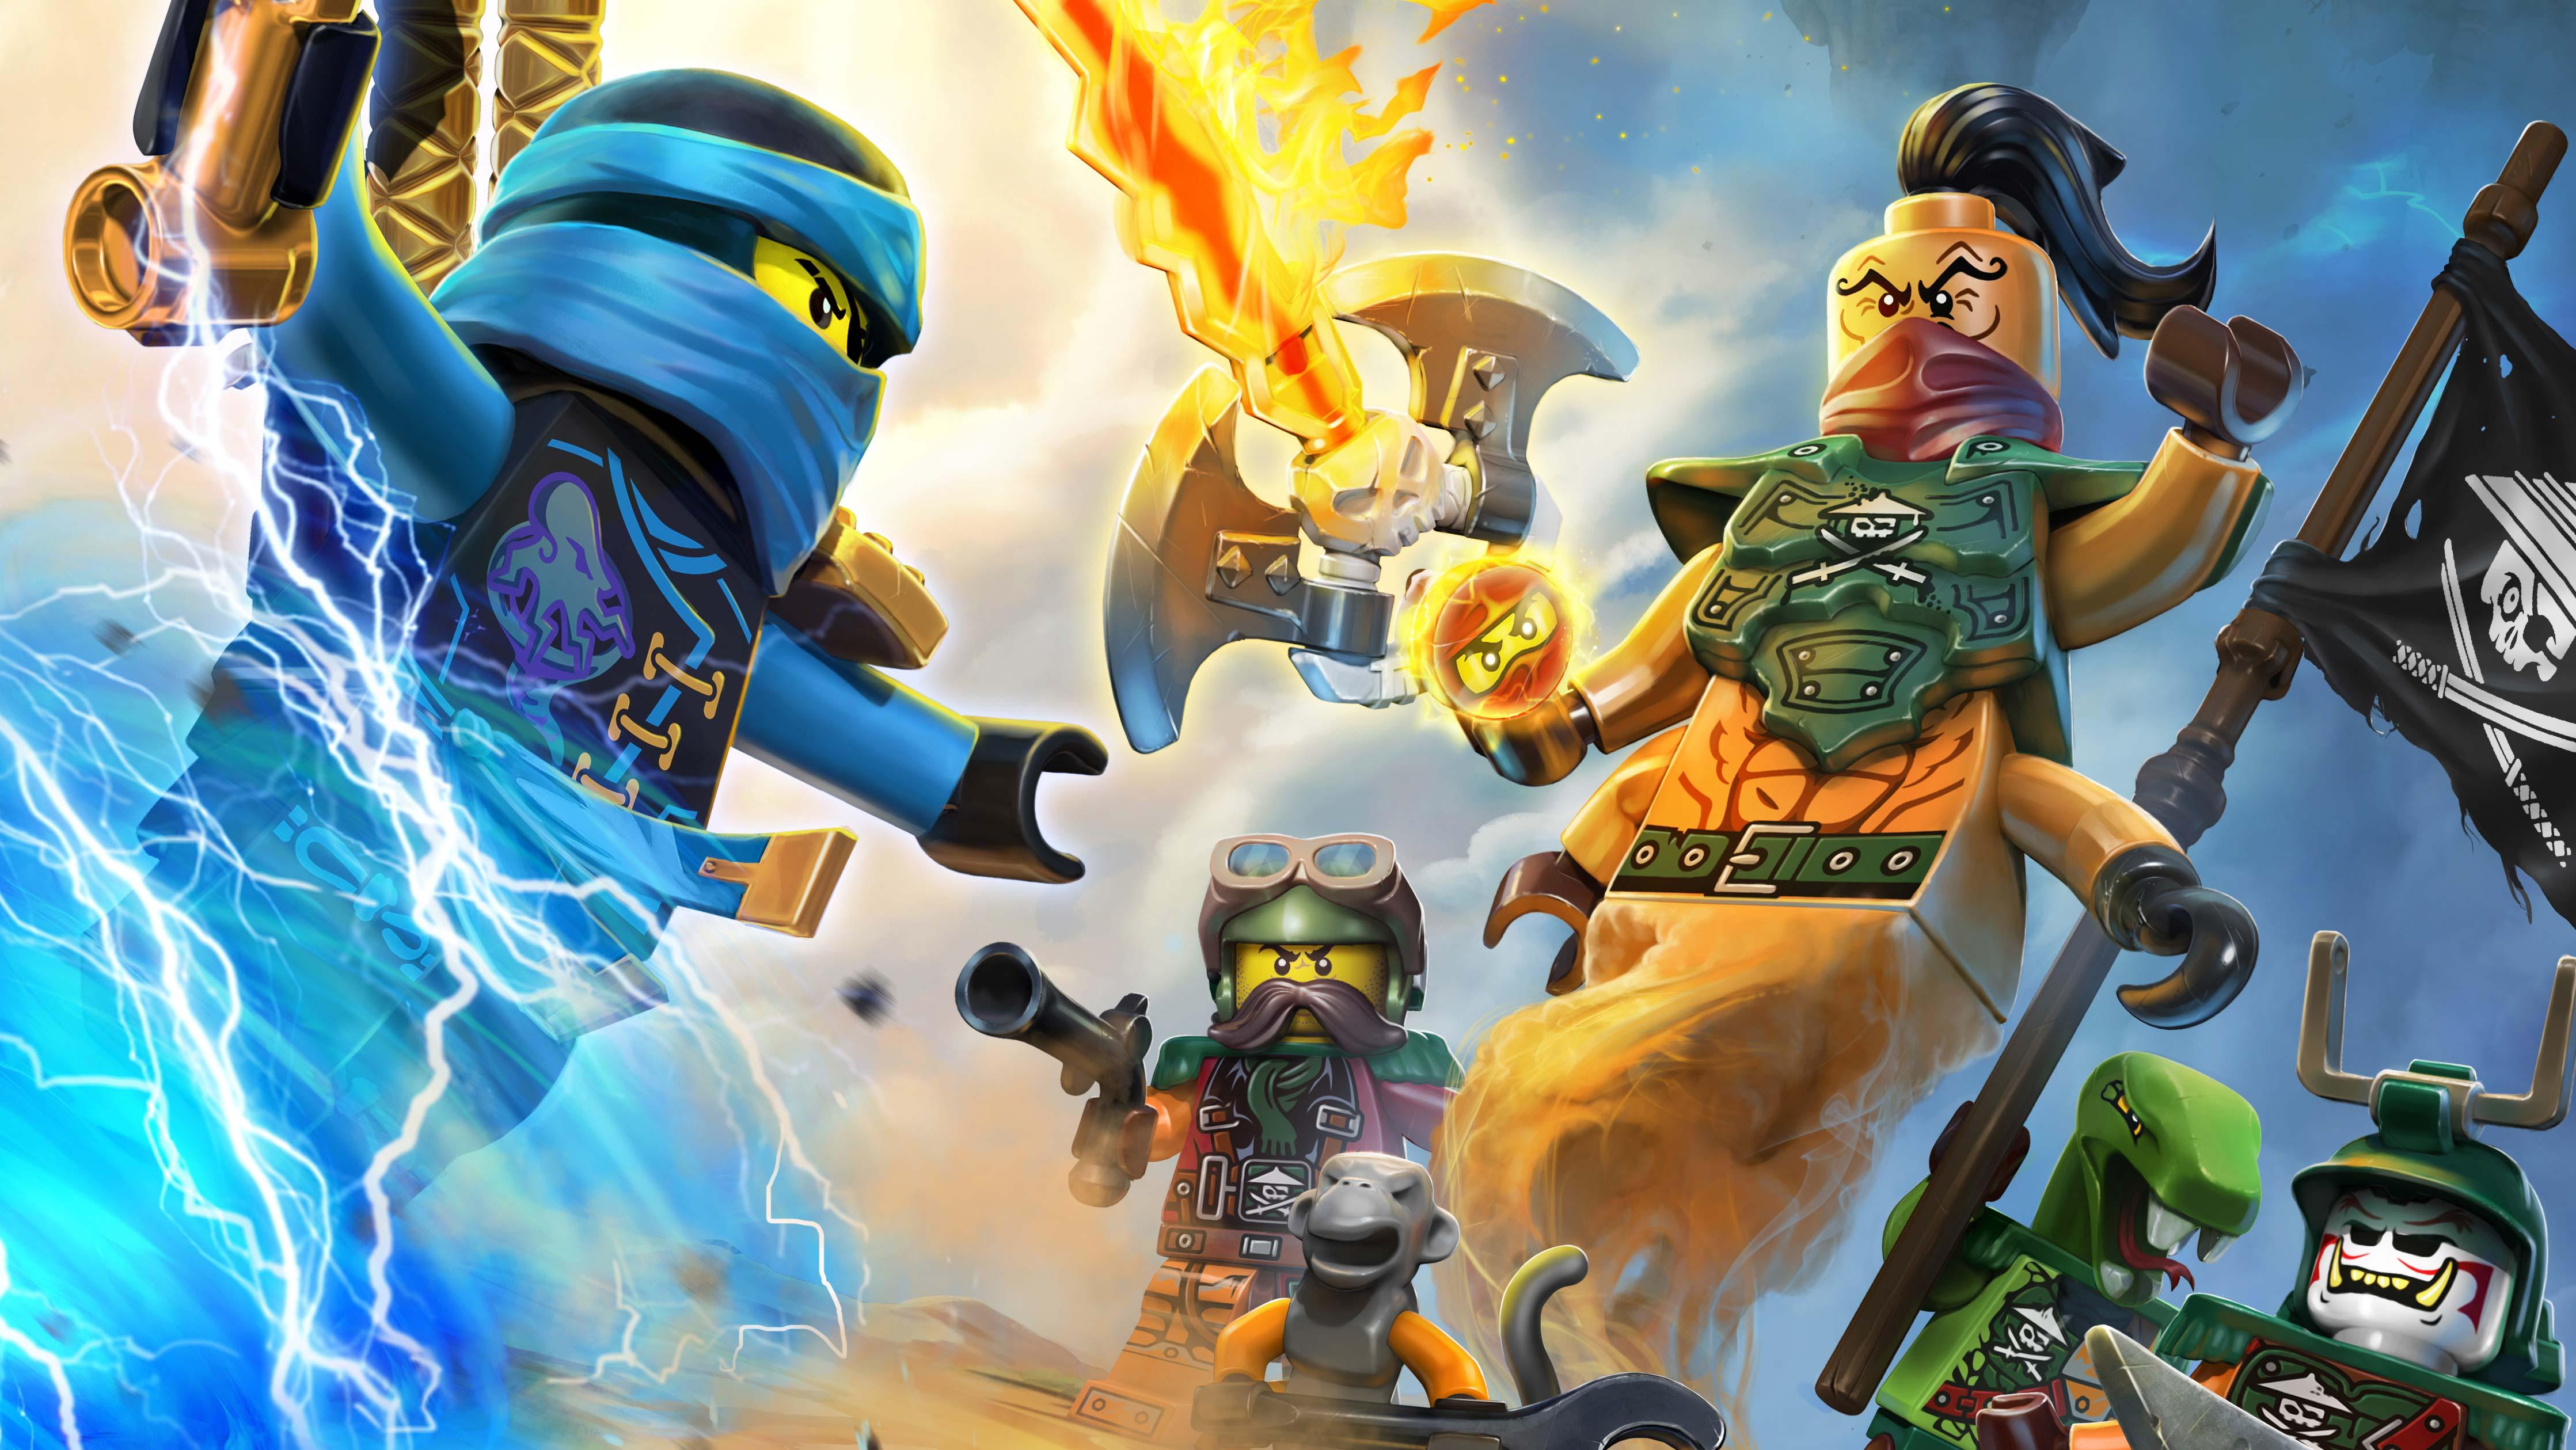 Coloriage ninjago et dessin gratuit imprimer - Ninjago jeux gratuit ...